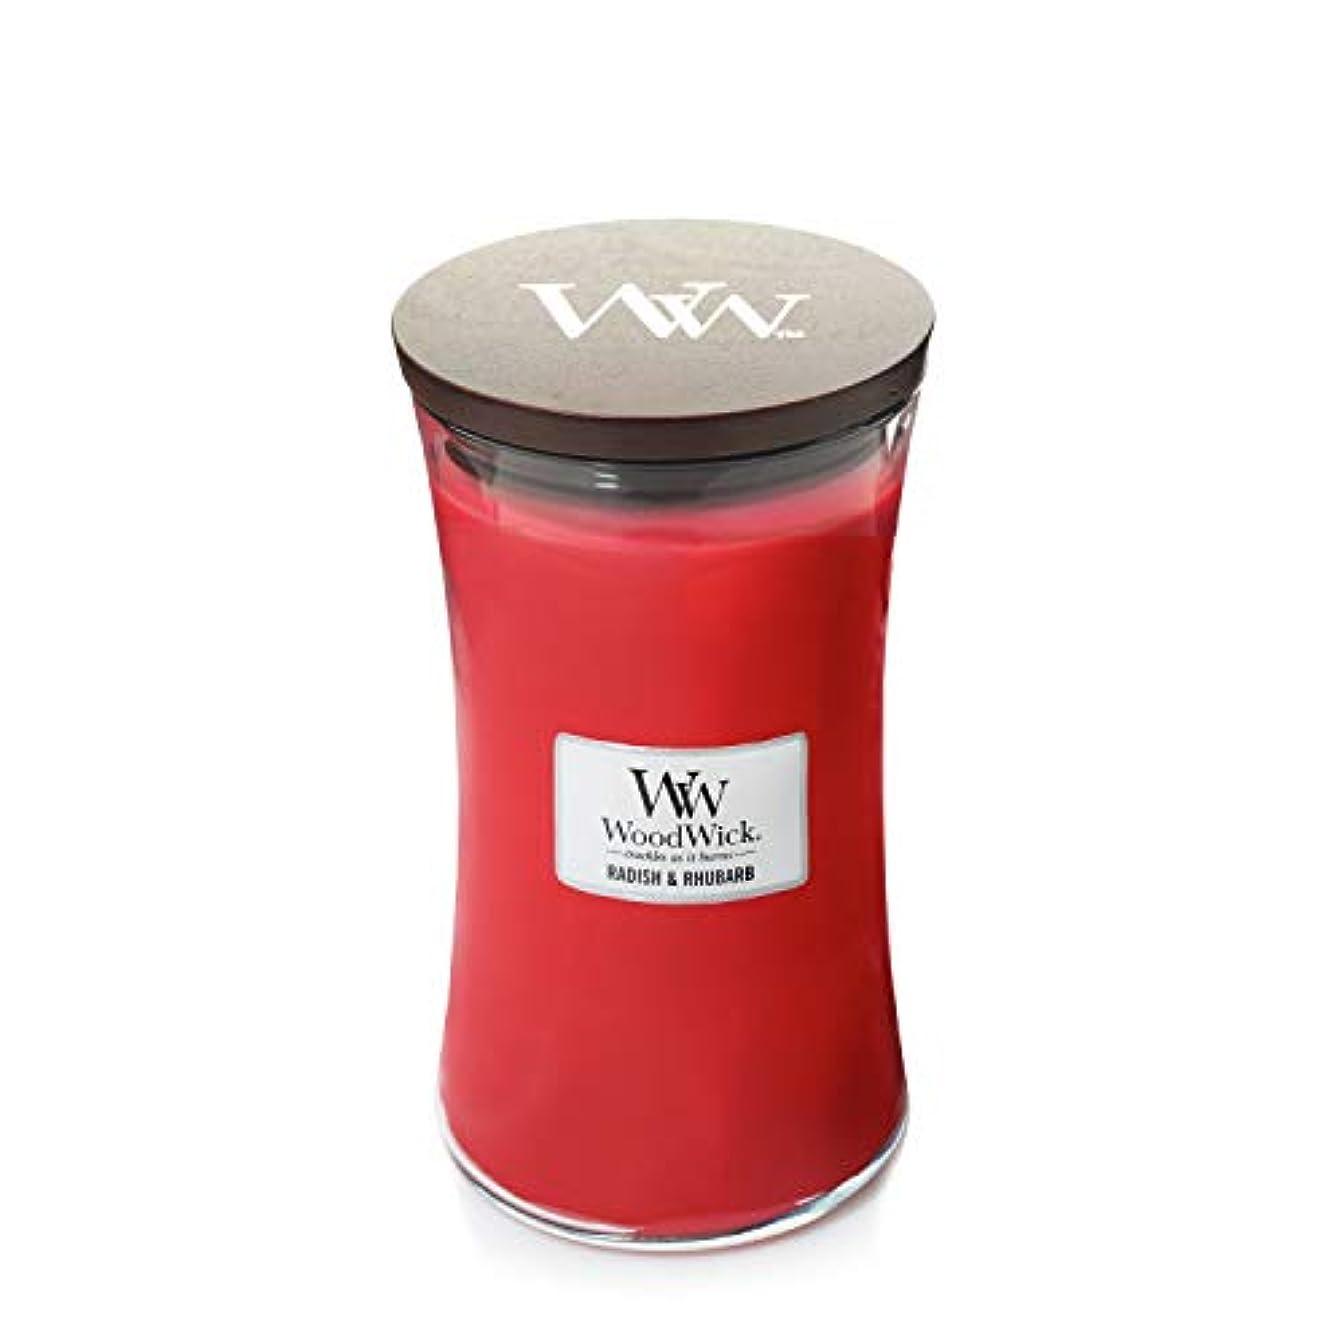 WoodWick Radish and Rhubarb Large Jar Scented Candle